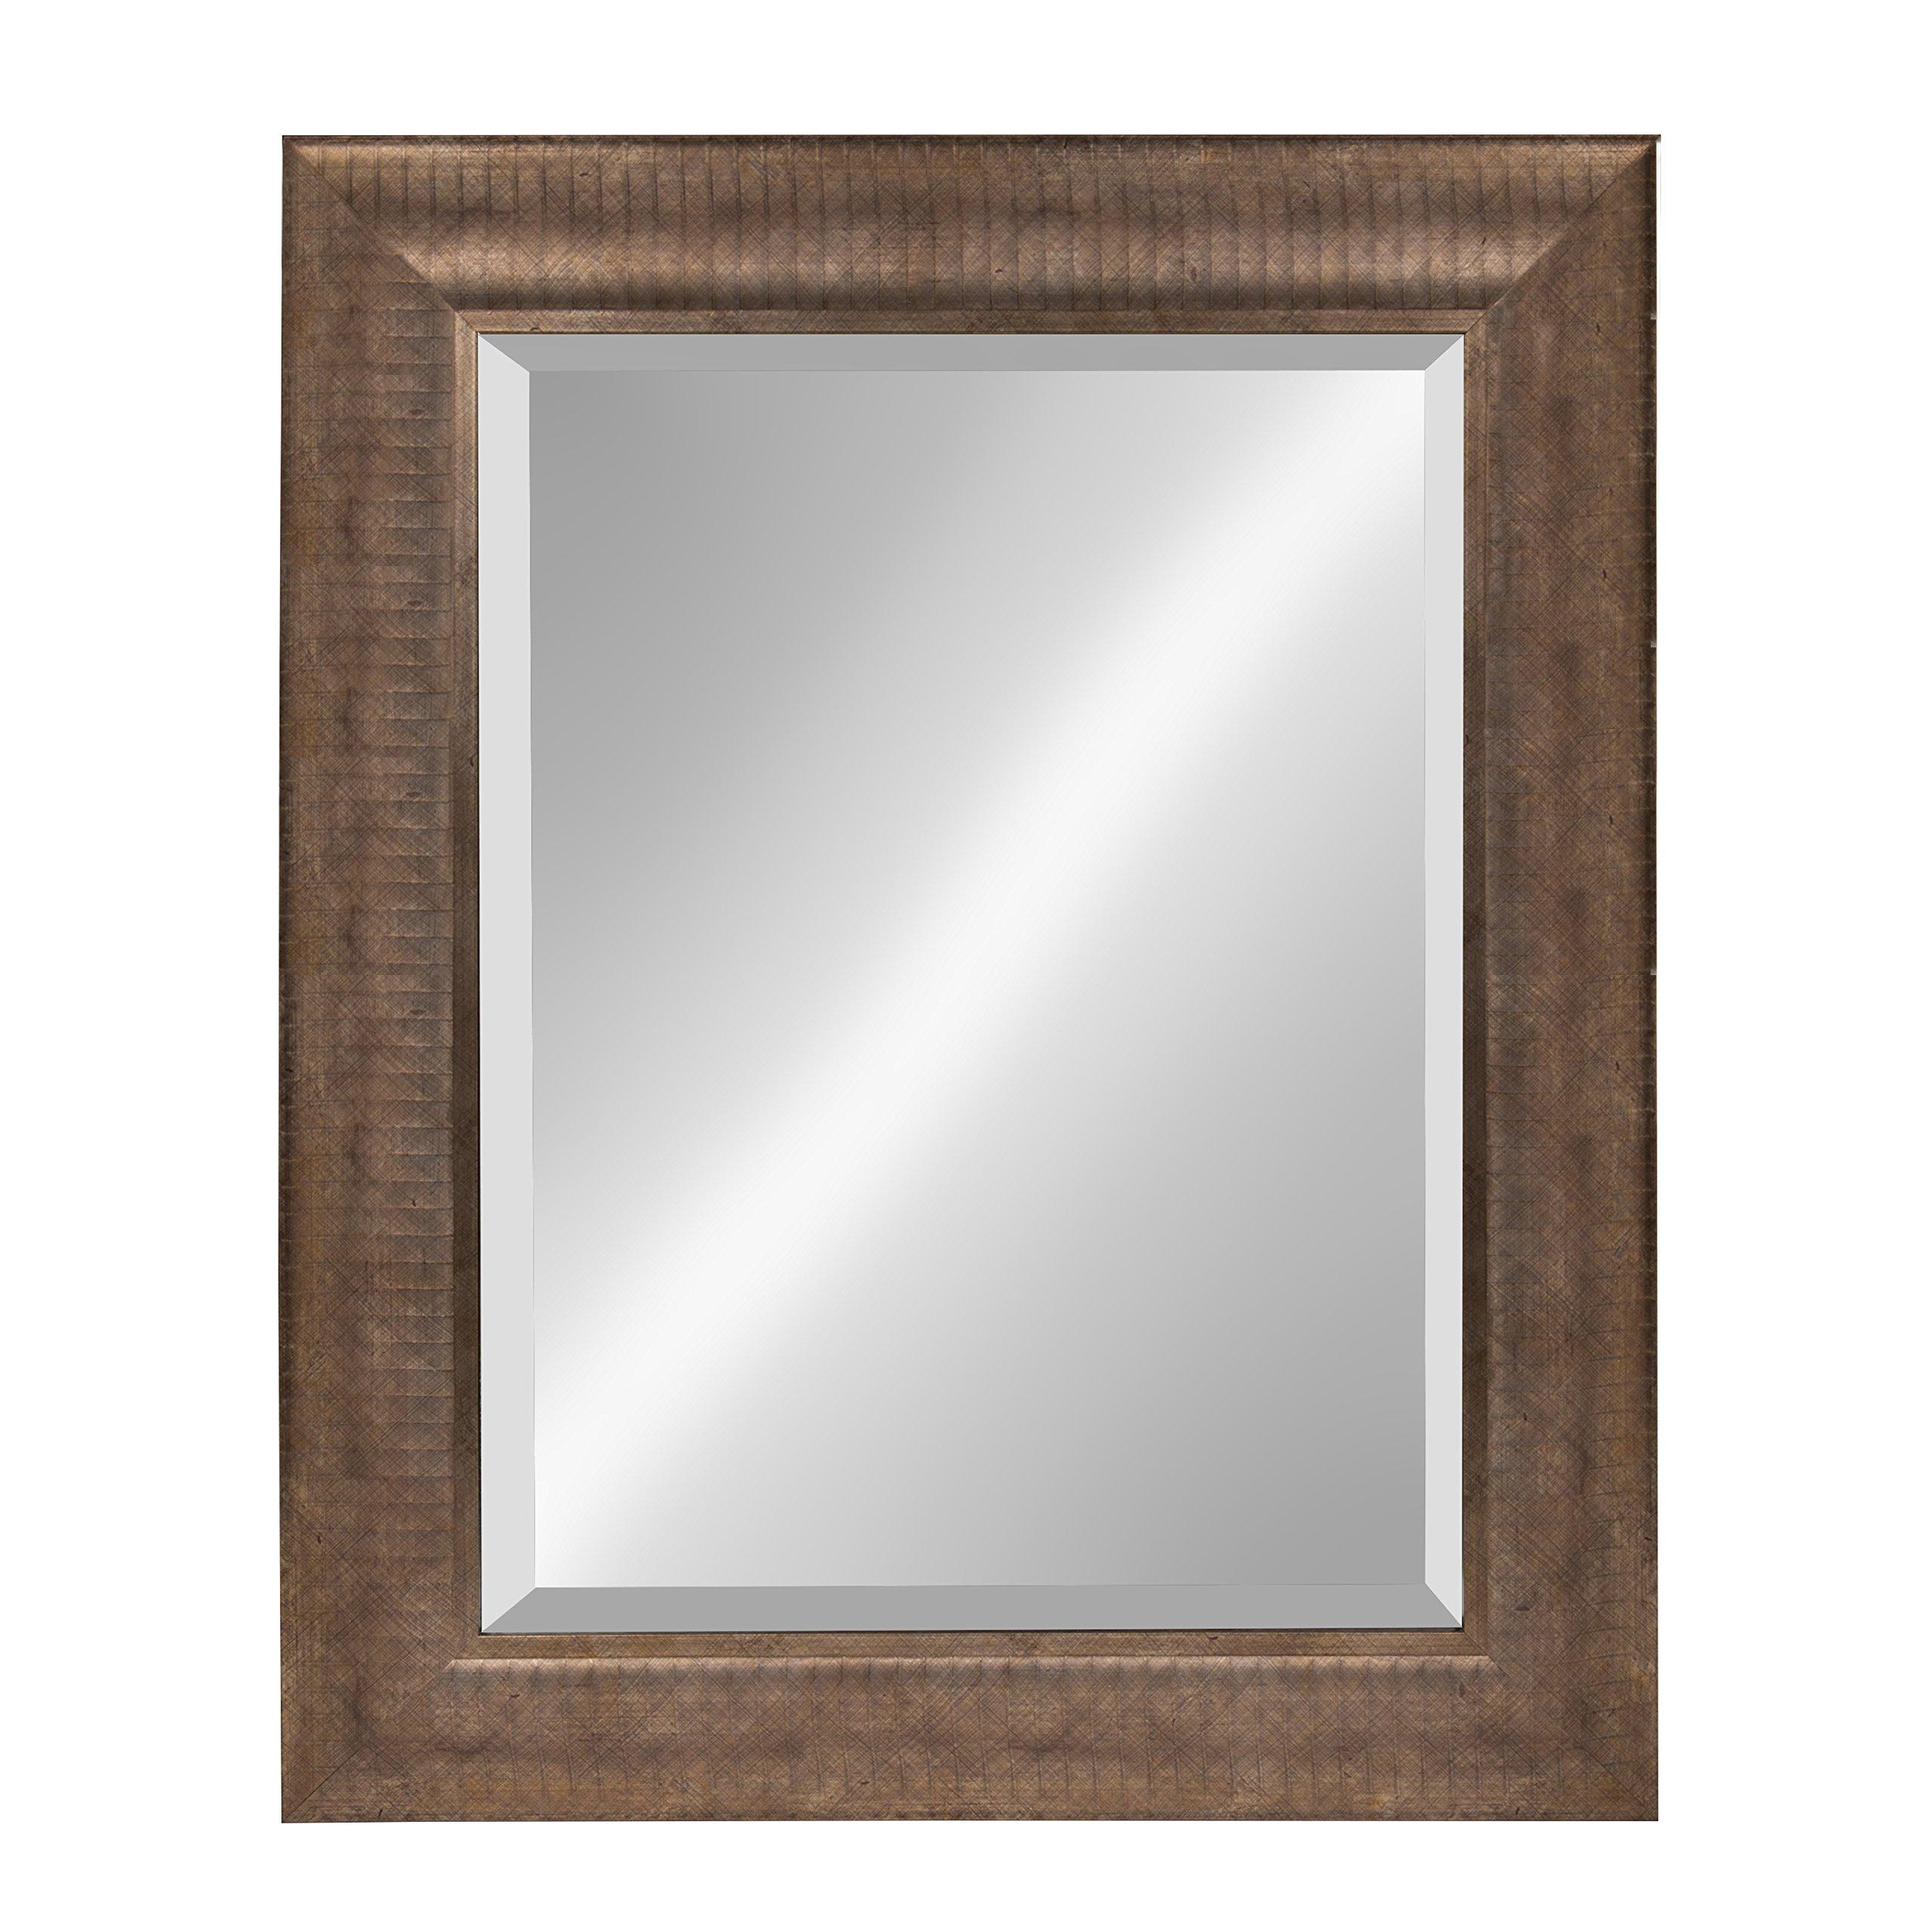 Kate and Laurel Carrollton Framed Wall Beveled Mirror, 25x31, Antique Brass